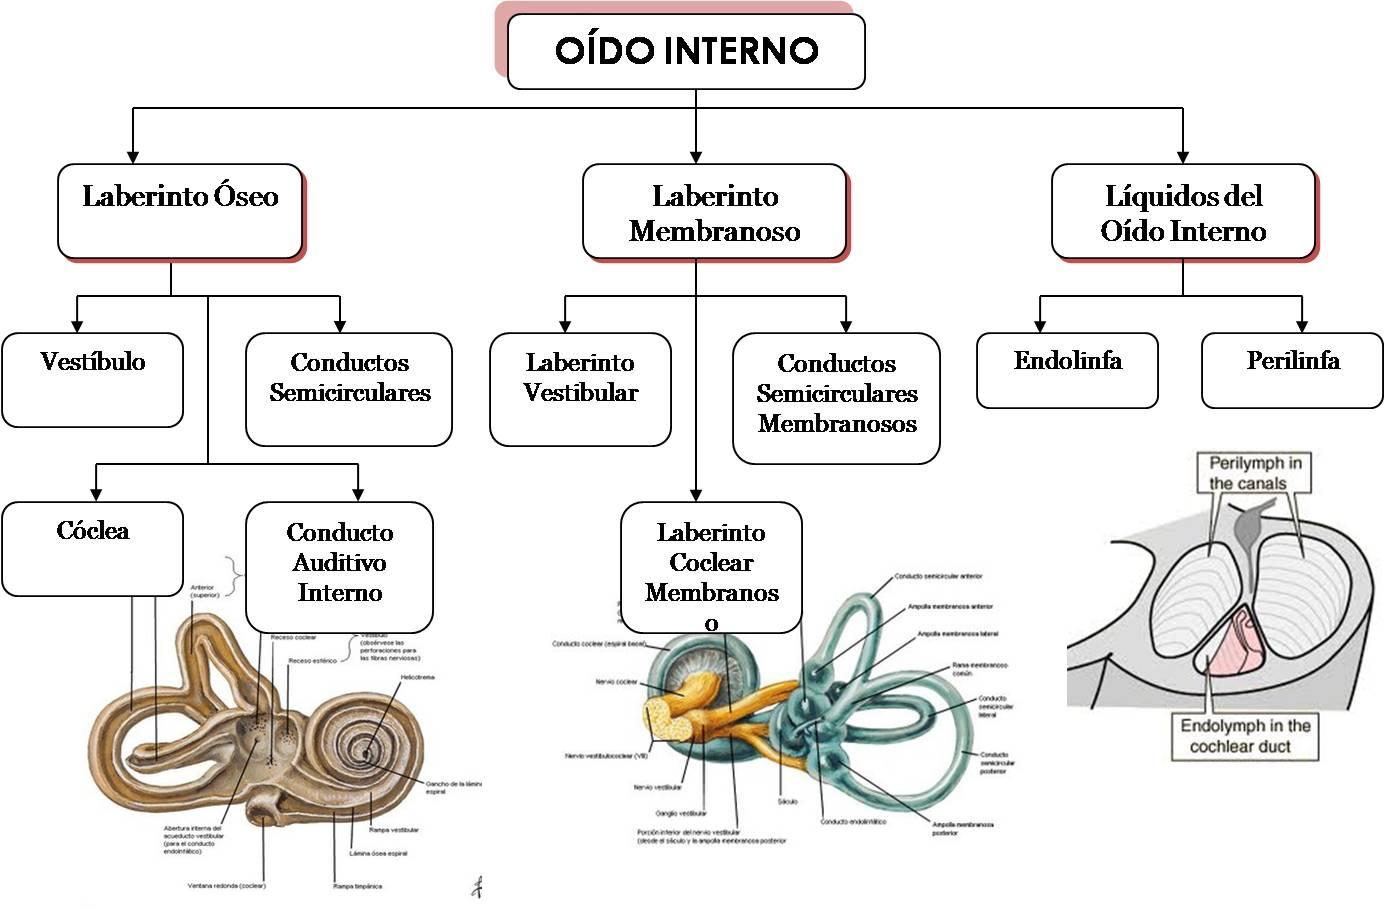 Anatomía: Oído Interno | ESBOZOS MÉDICOS